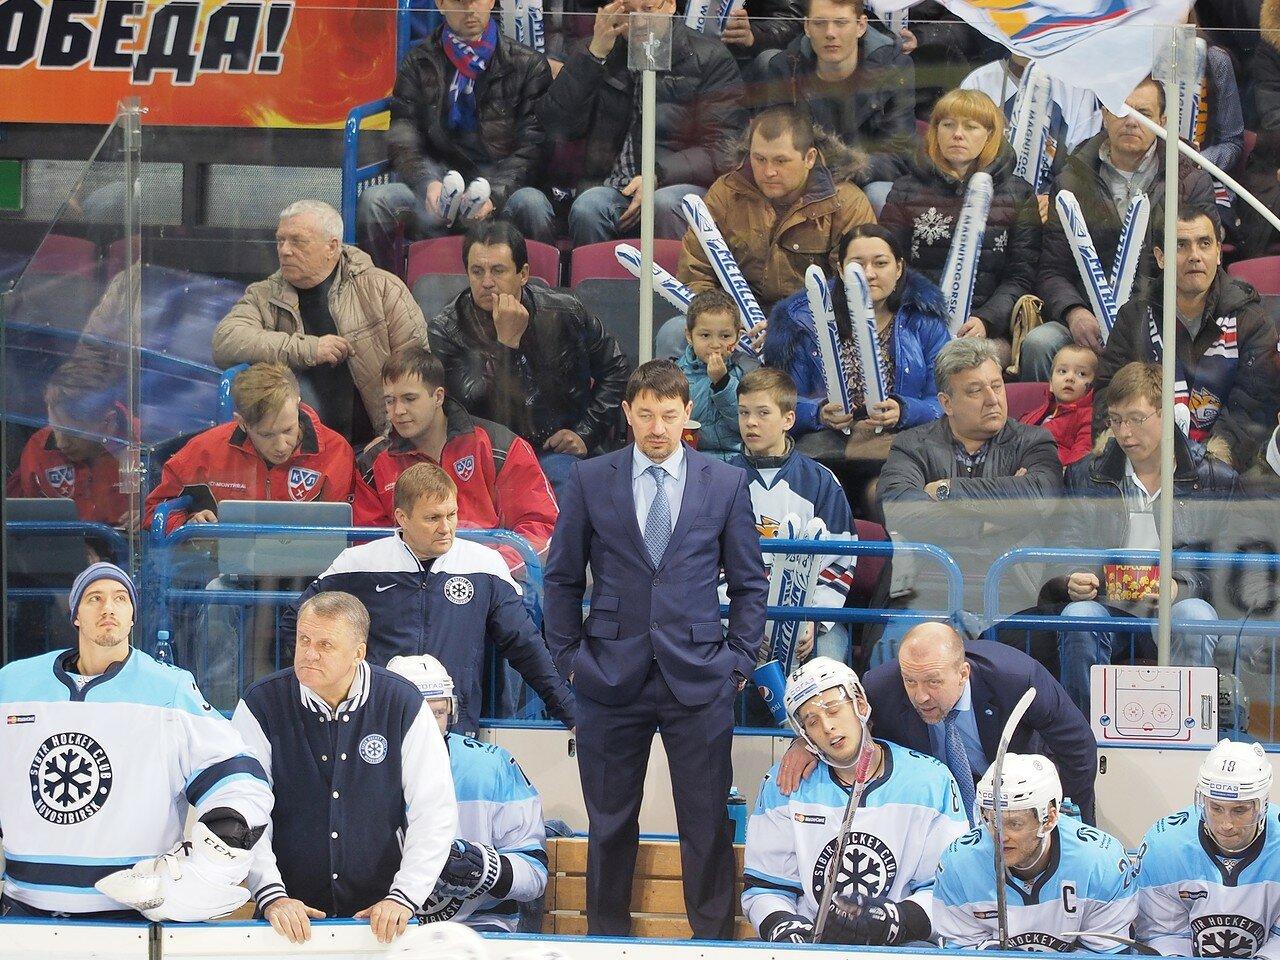 93Восток 1/2 плей-офф Металлург - Сибирь 08.03.2016